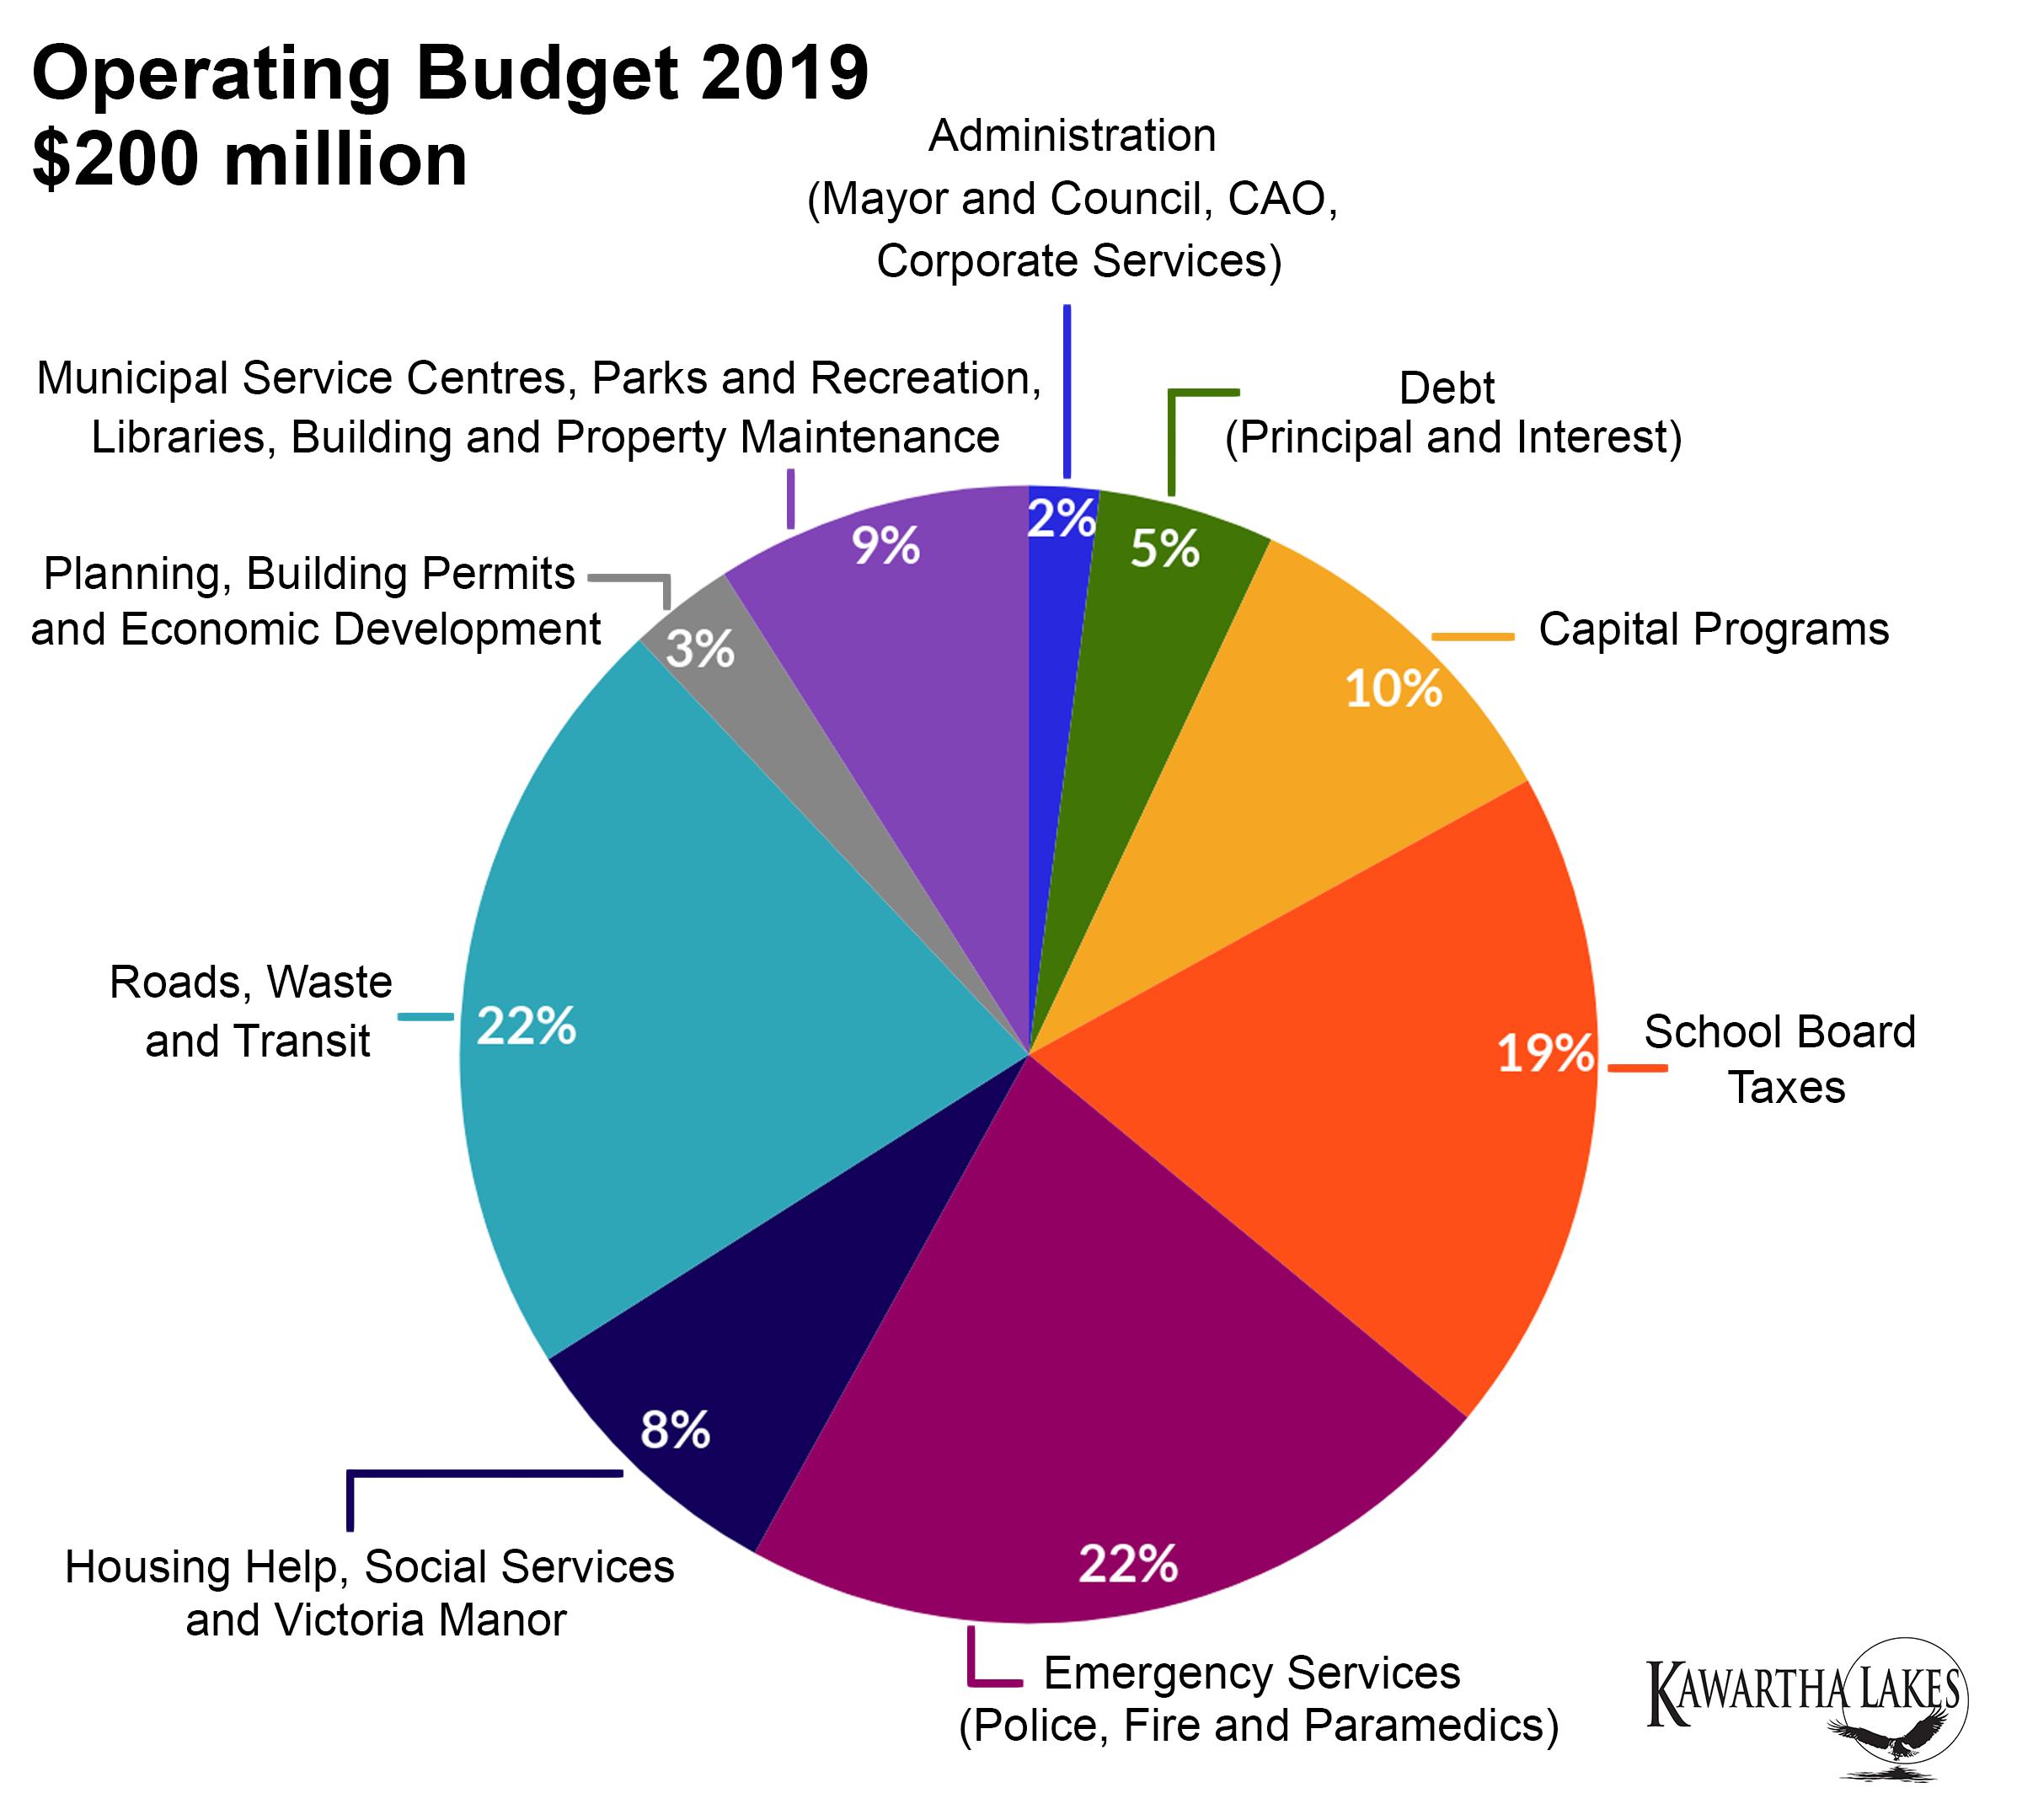 Operating Budget breakdown